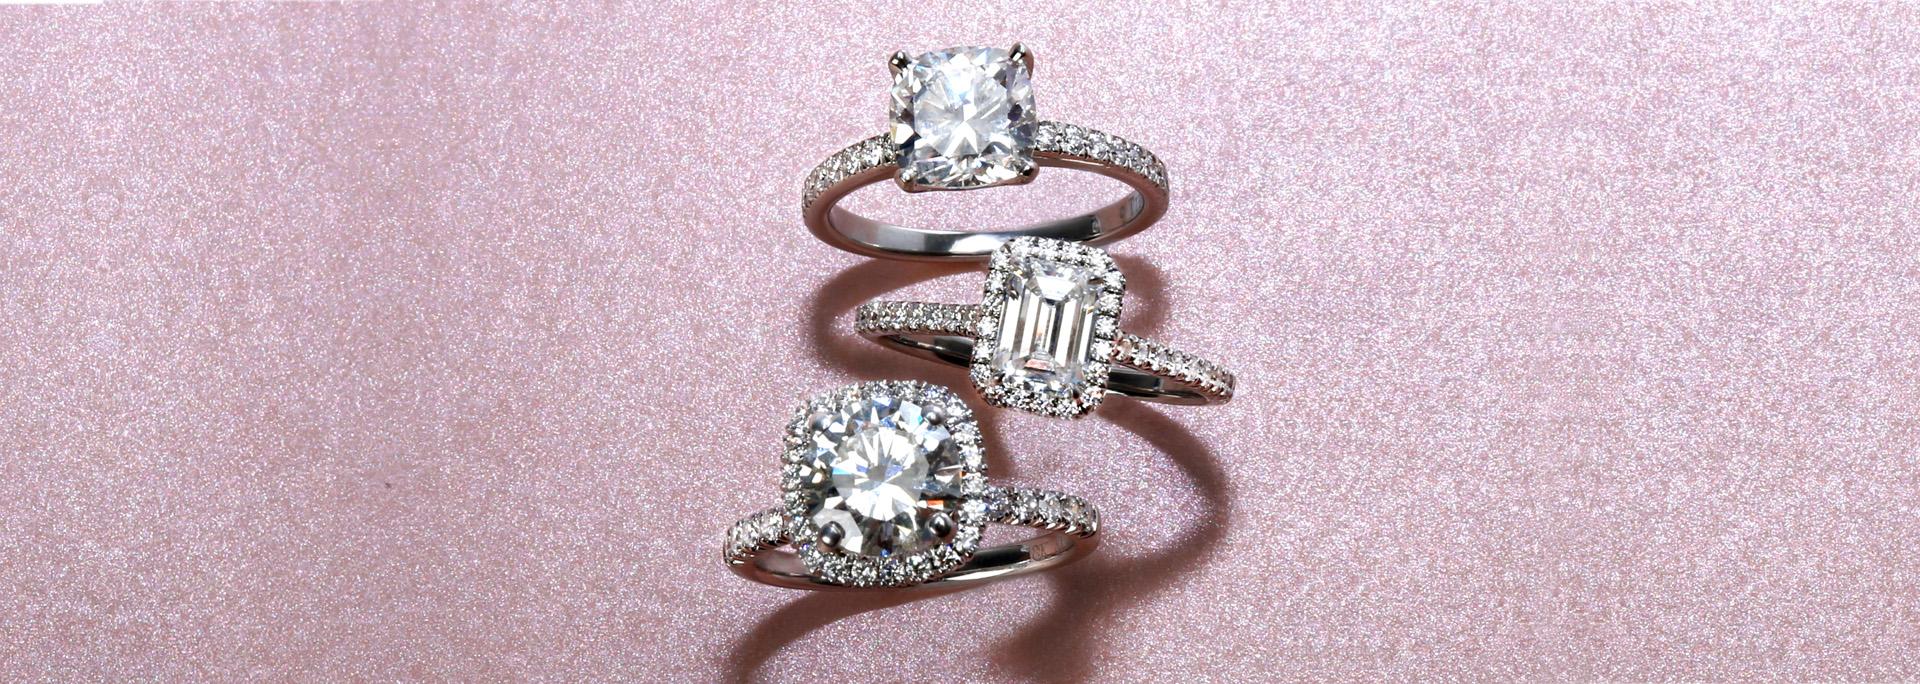 Winter Jewelry trends